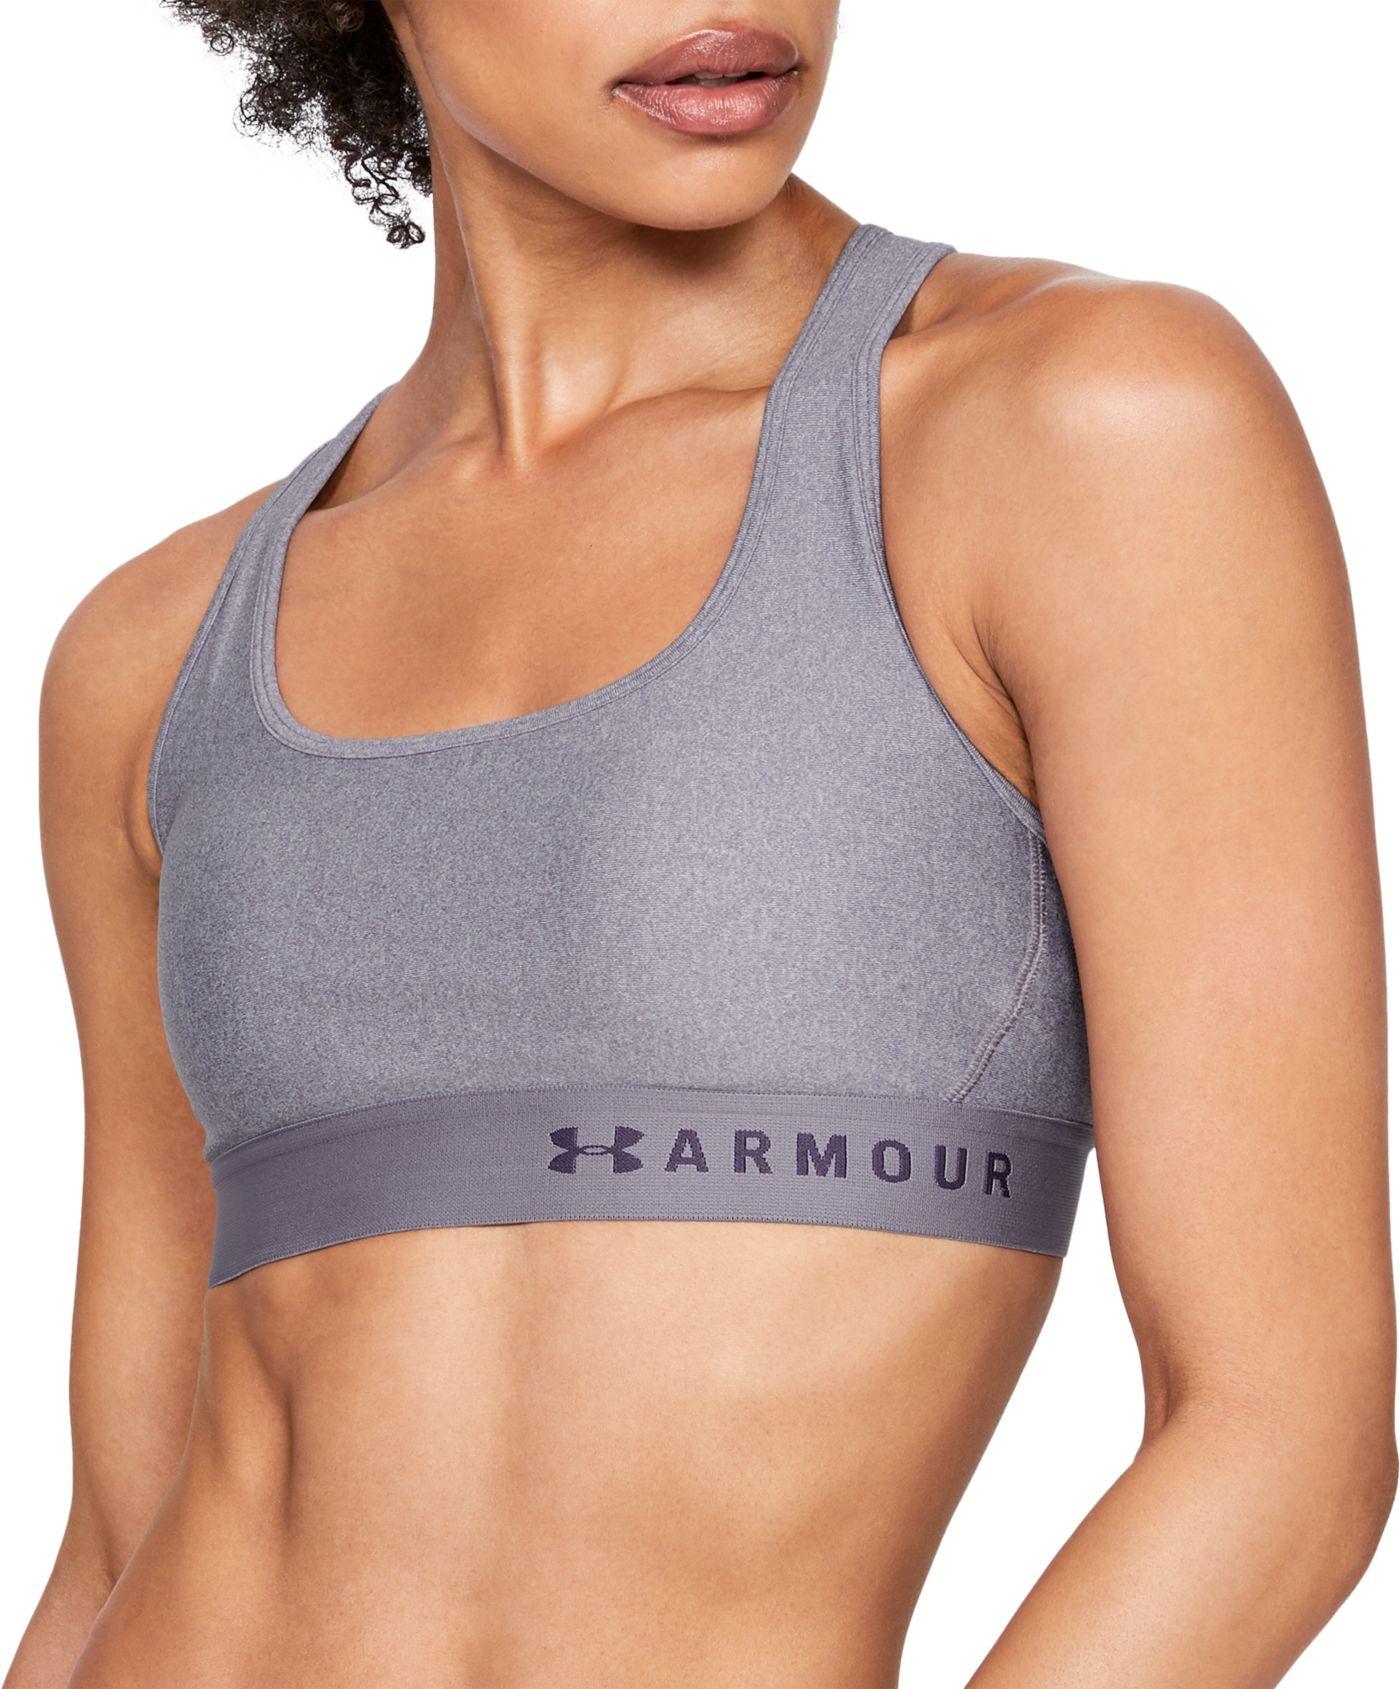 Under Armour Women's Armour Medium Impact Crossback Sports Bra